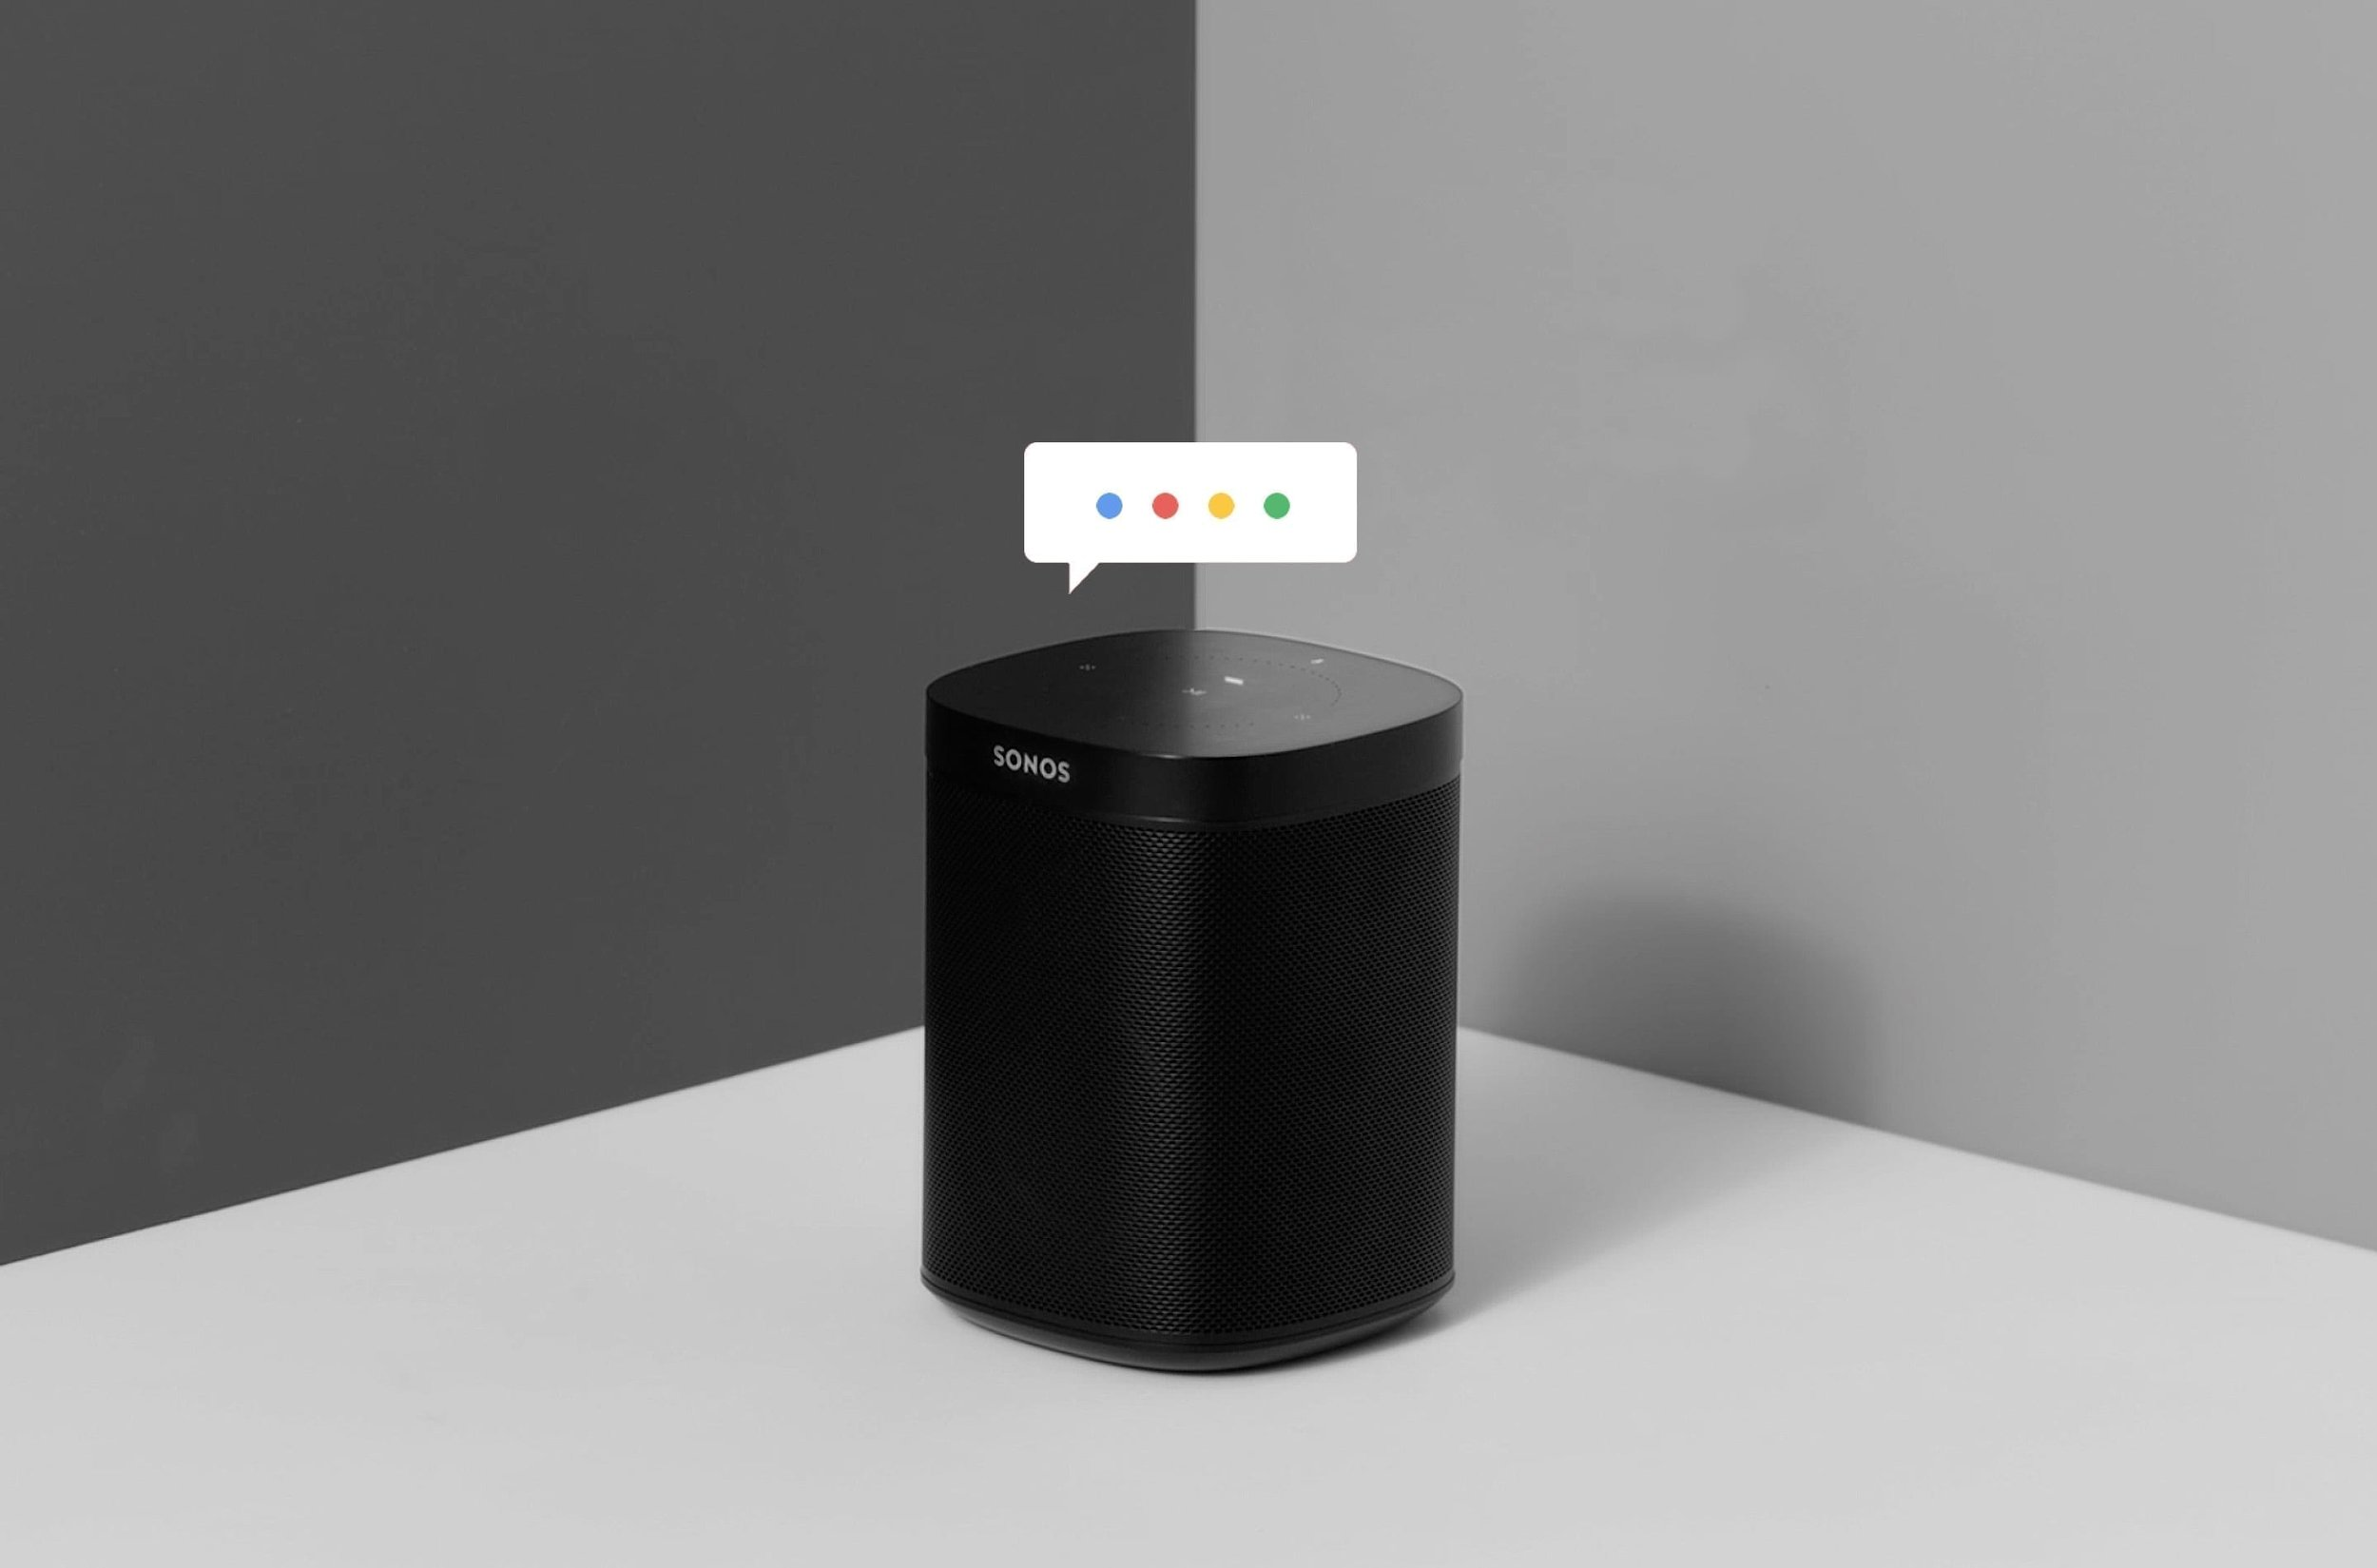 Sonos Google Assistant.jpg